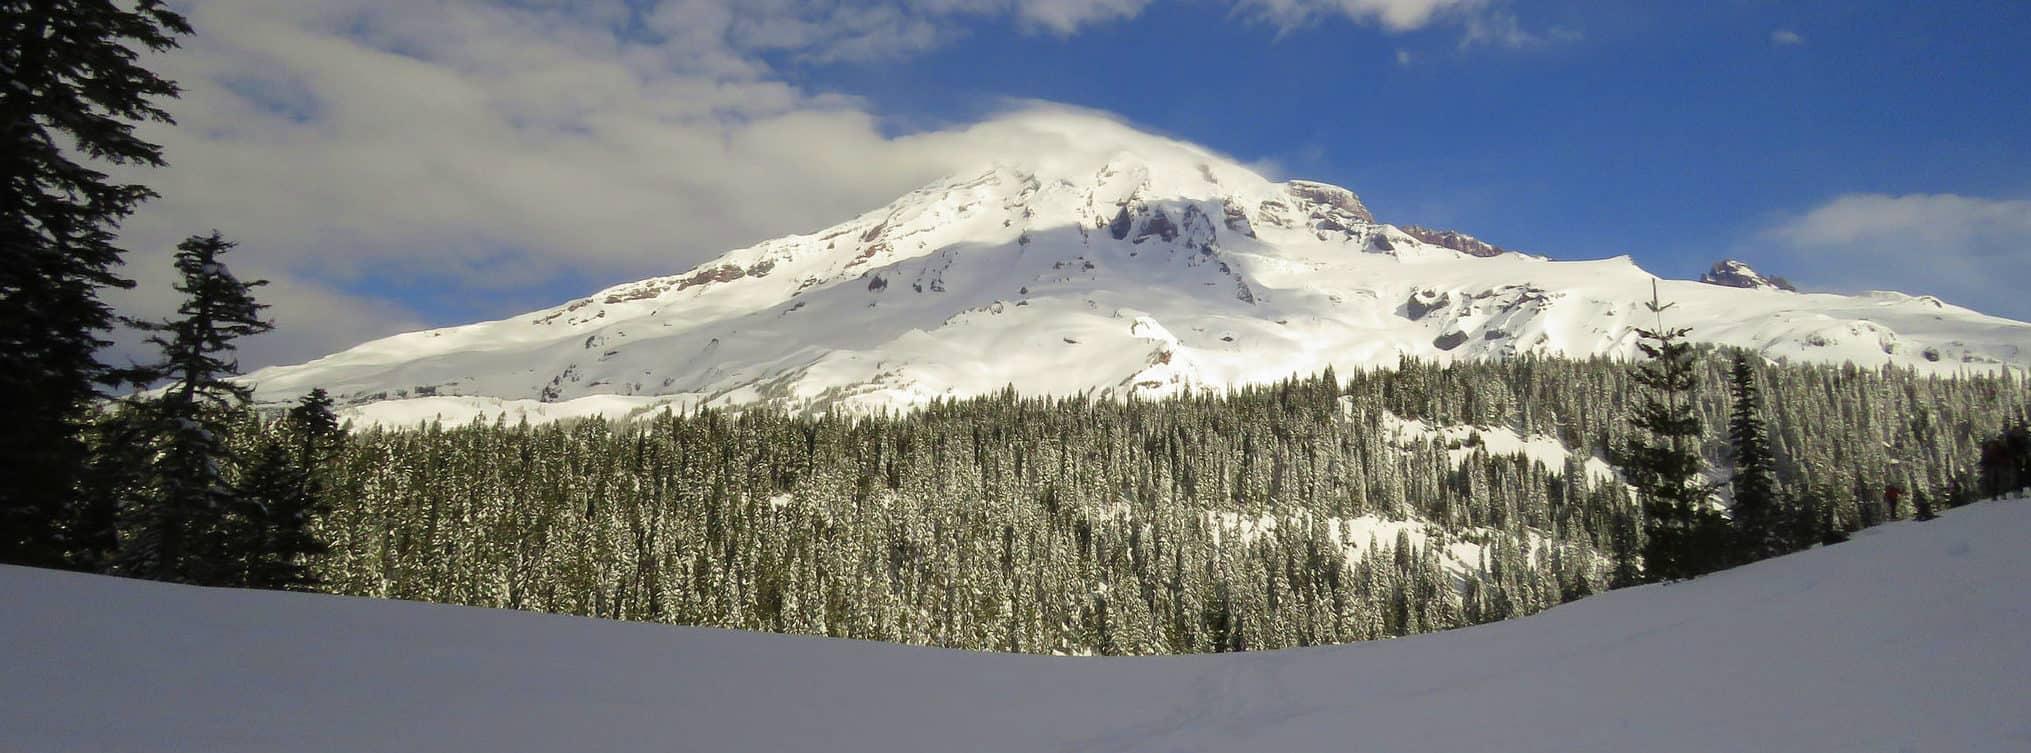 Mt Rainier Photo Courtesy Janelle Walker